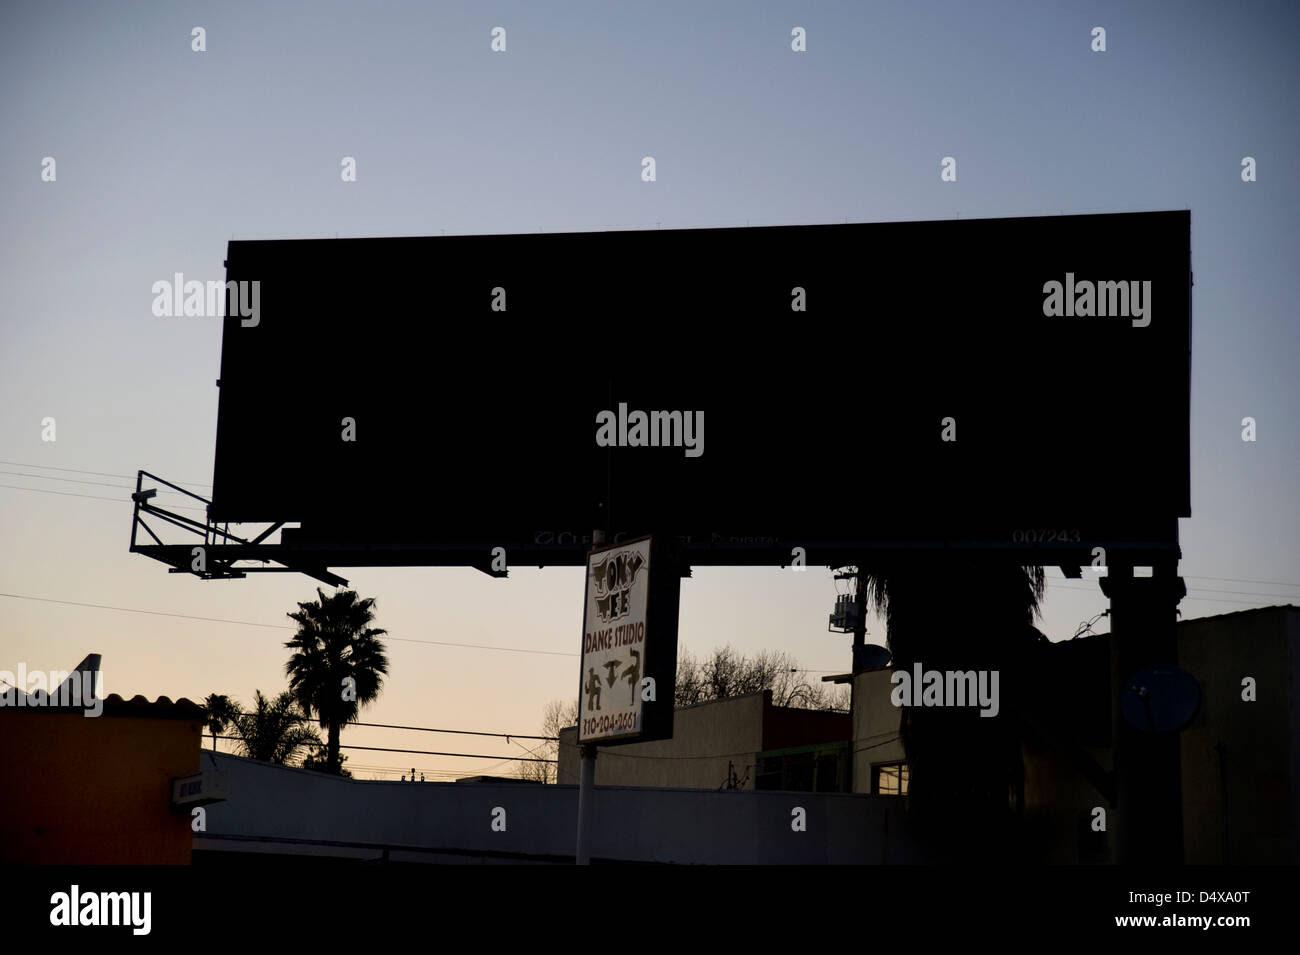 Blank Digital Billboard At Dusk In Los Angeles Stock Photo ...